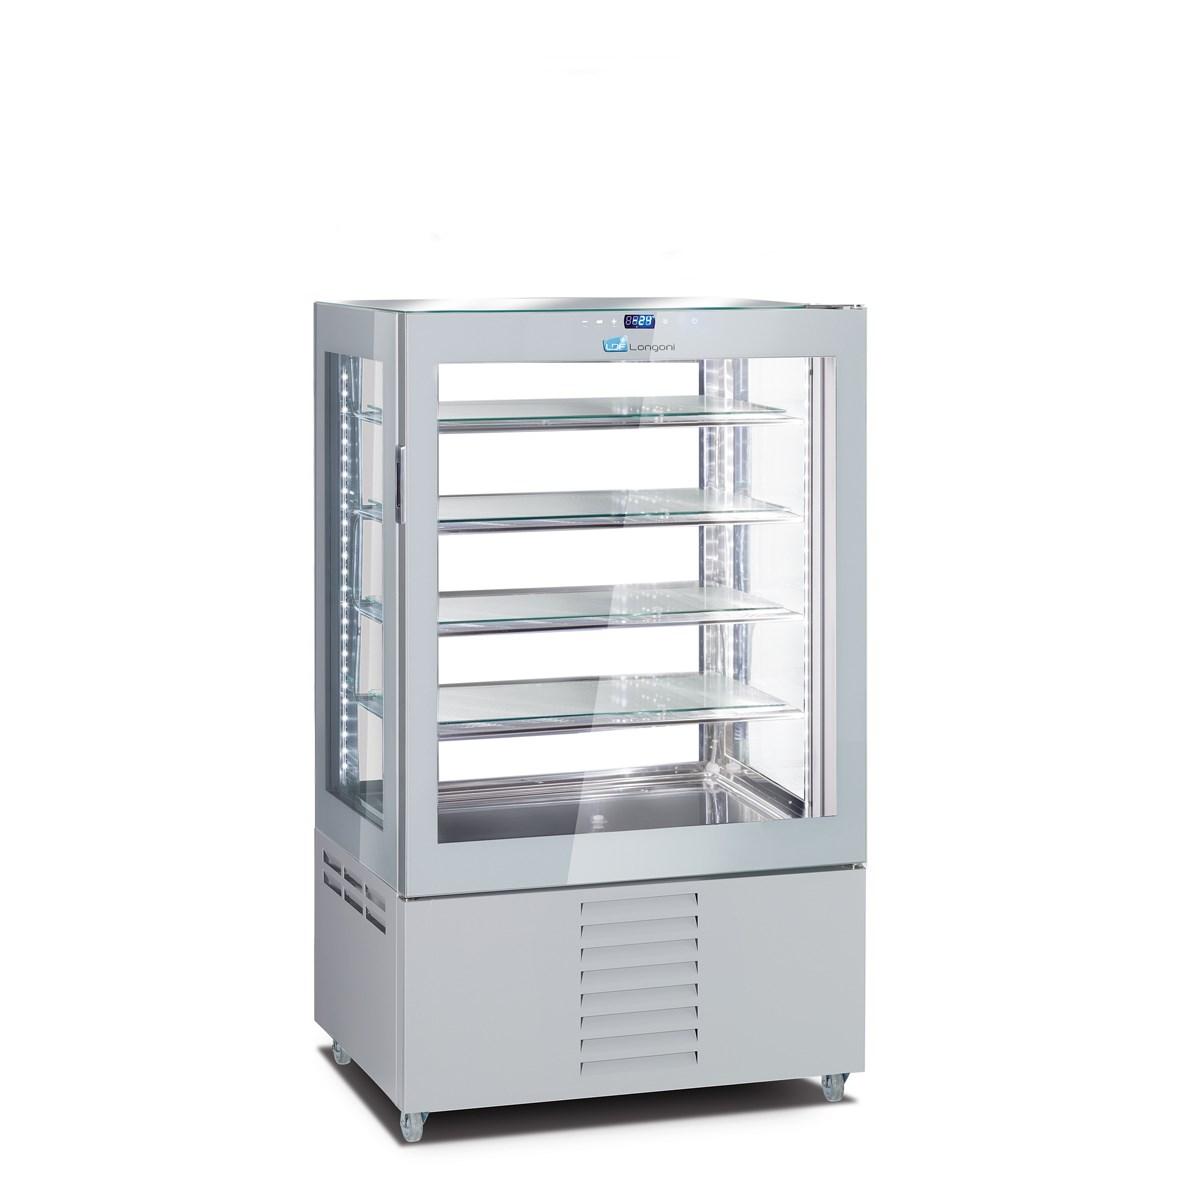 8114-s-vitra-gelateria